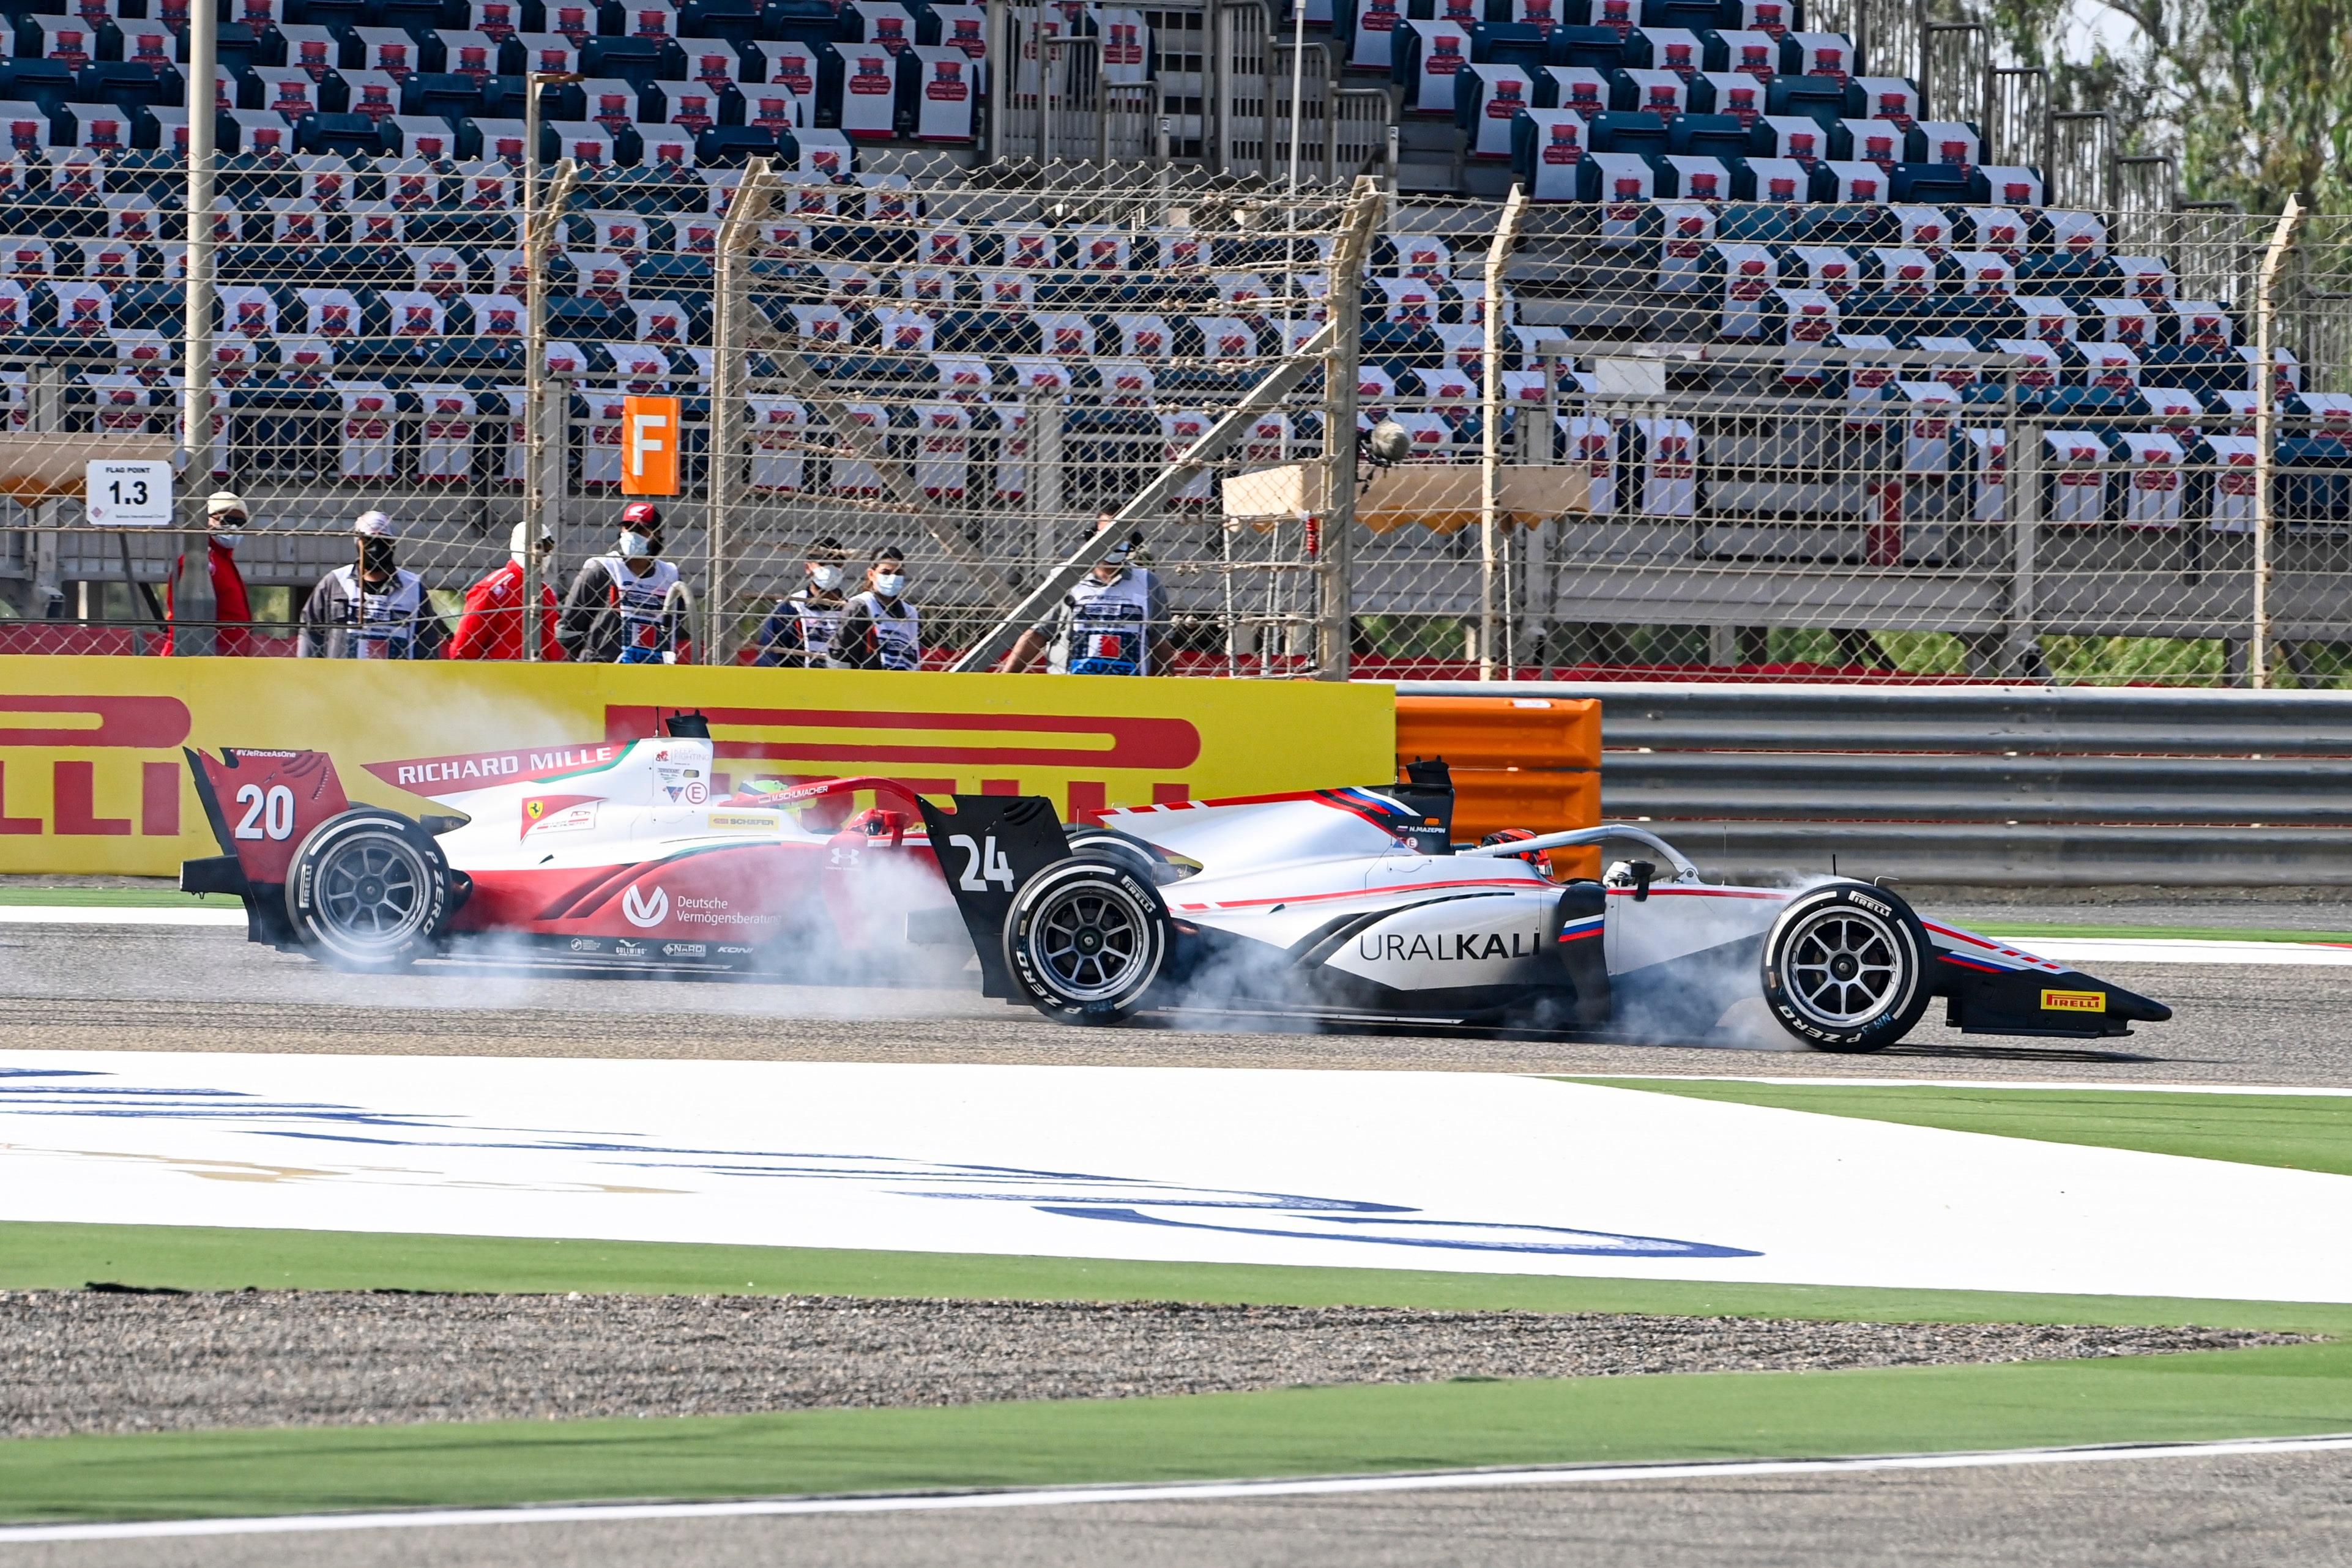 Mick Schumacher and Nikita Mazepin battle in F2 in 2020